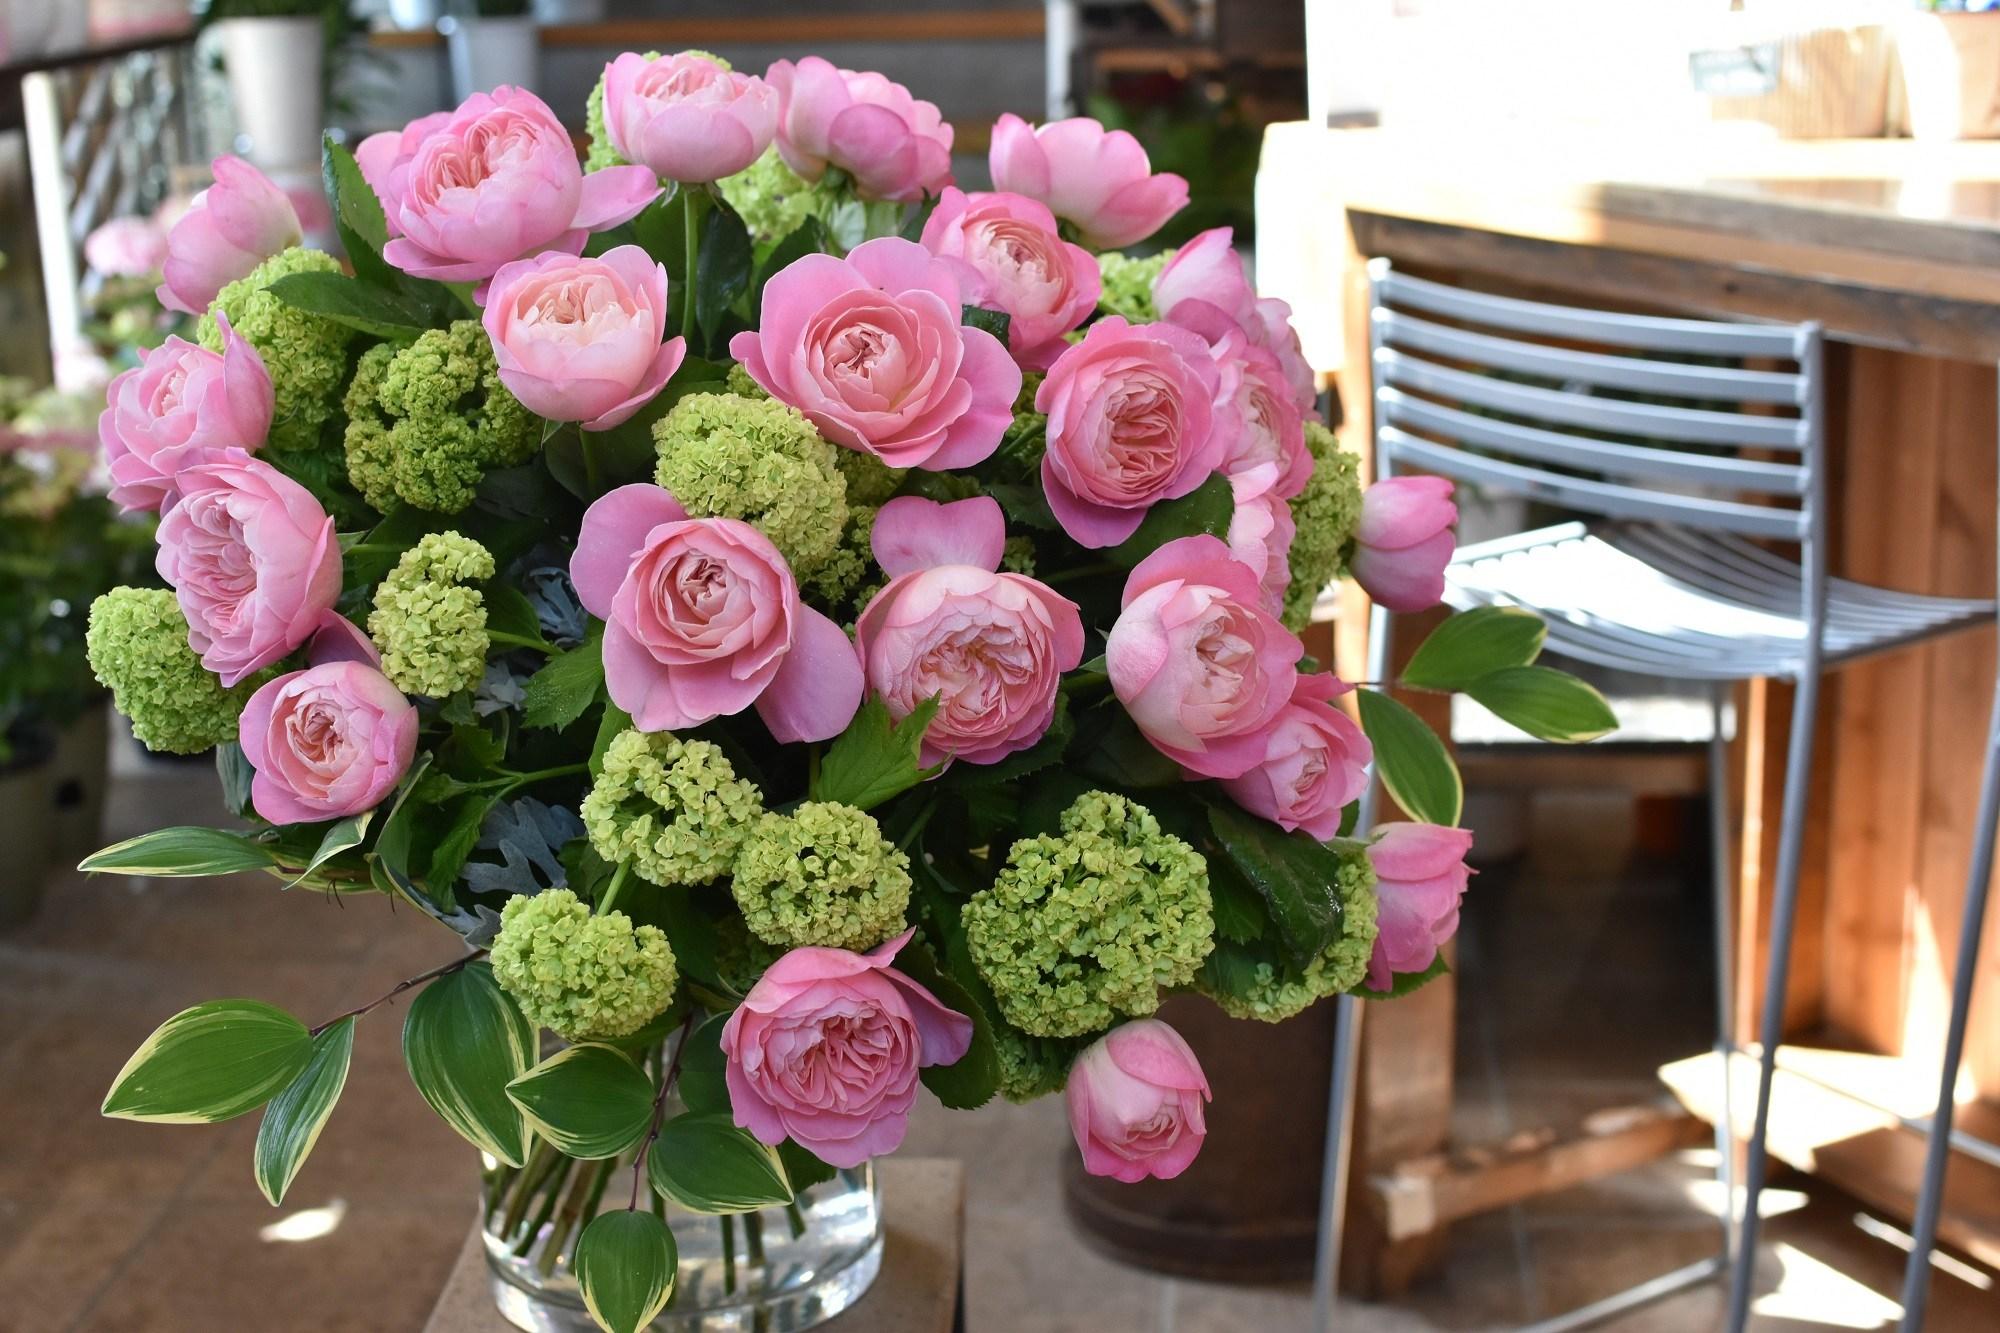 Natural Flower House 店舗のご案内